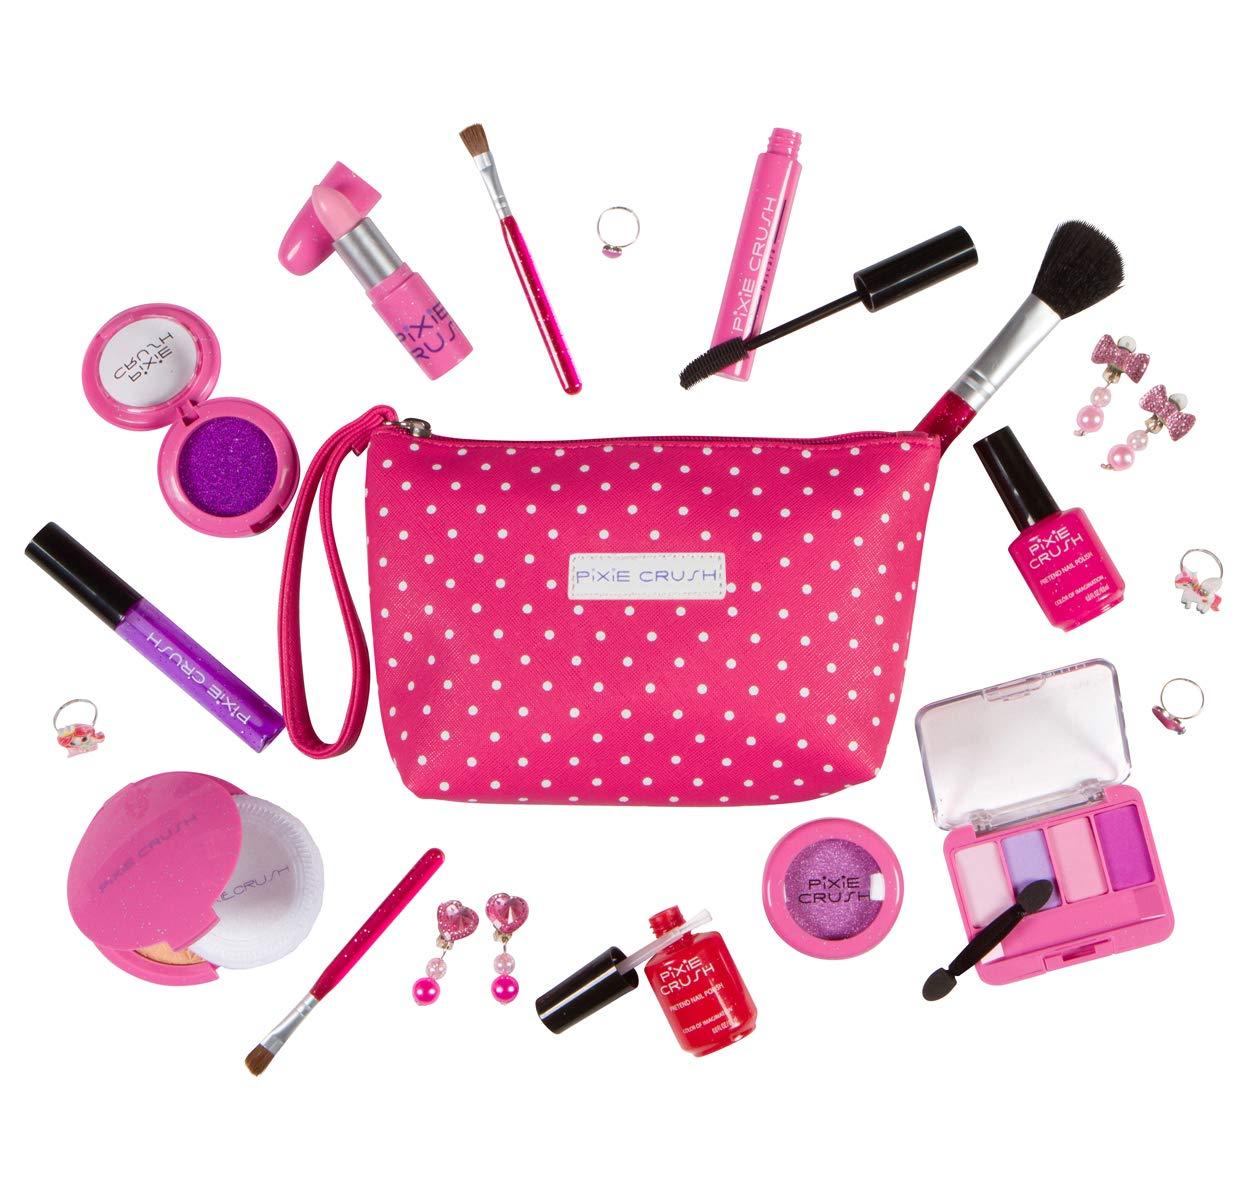 PixieCrush Pretend Play Cosmetic and Makeup Set - 19 Piece Designer Kit with Pink Polka Dot Handbag by PixieCrush